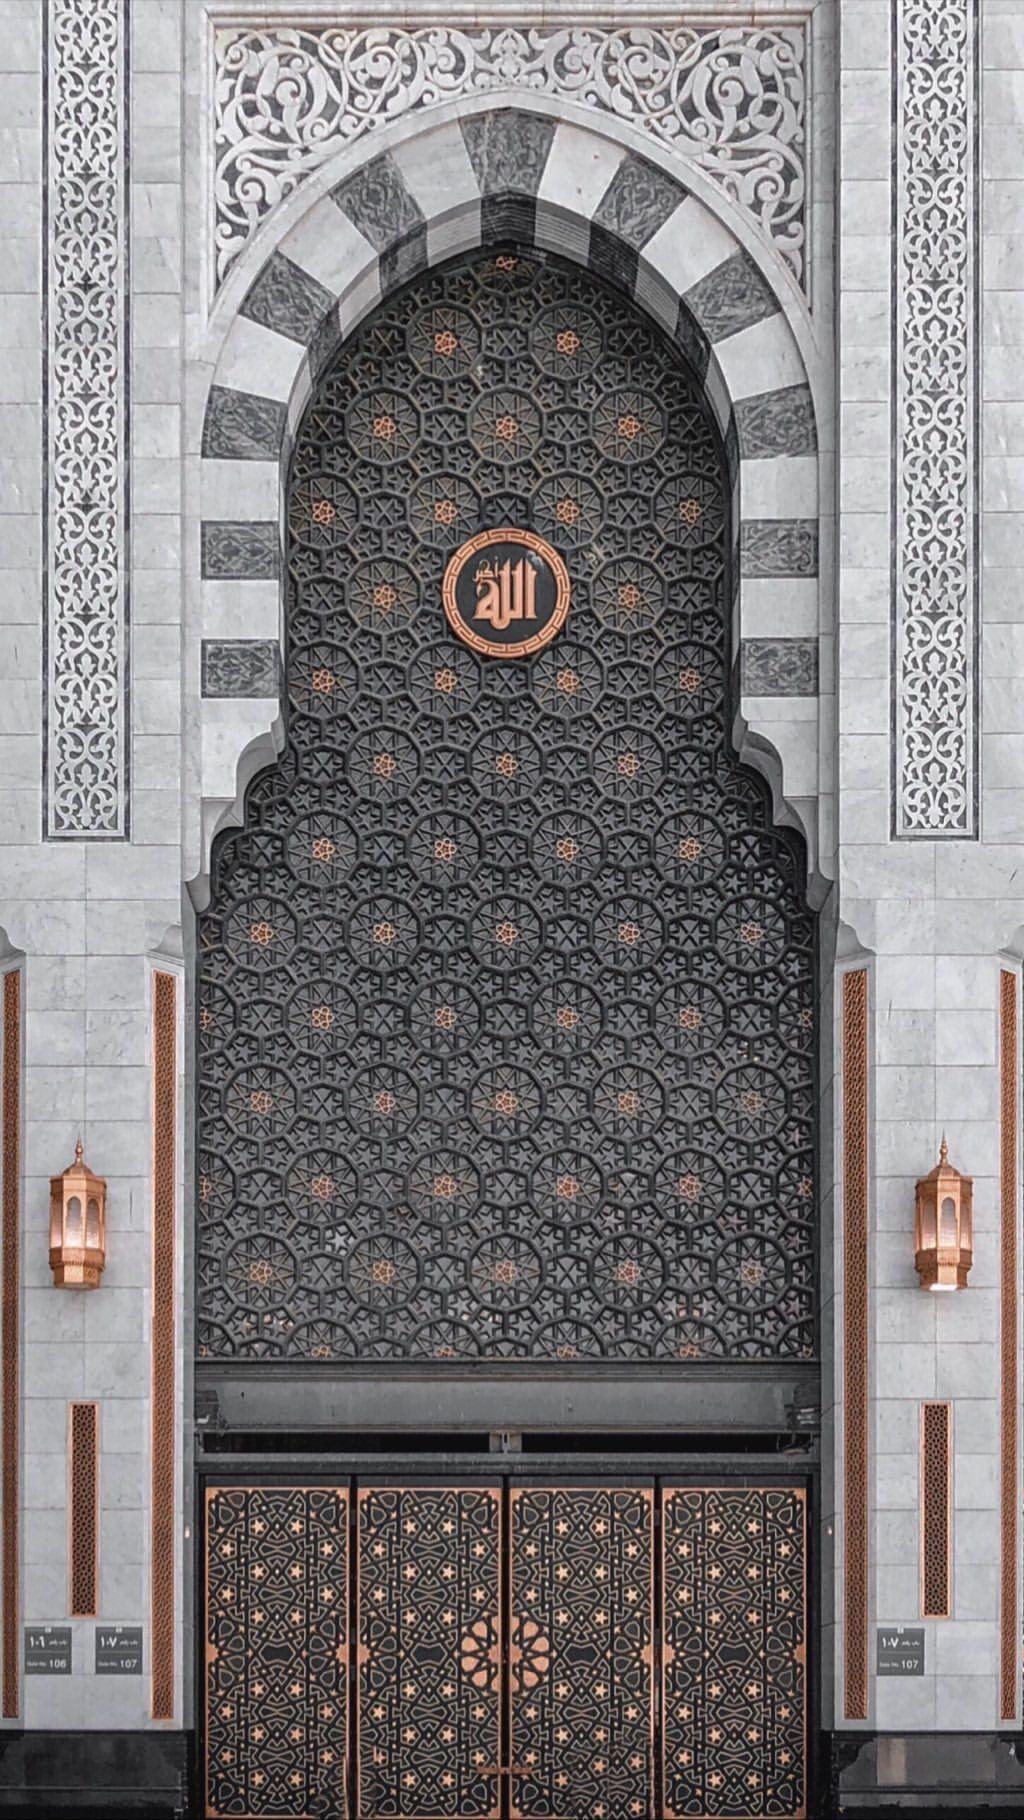 Pin Oleh Rishana Sherin Di Streetart Wallpaper Islami Arsitektur Budaya Arsitektur Masjid